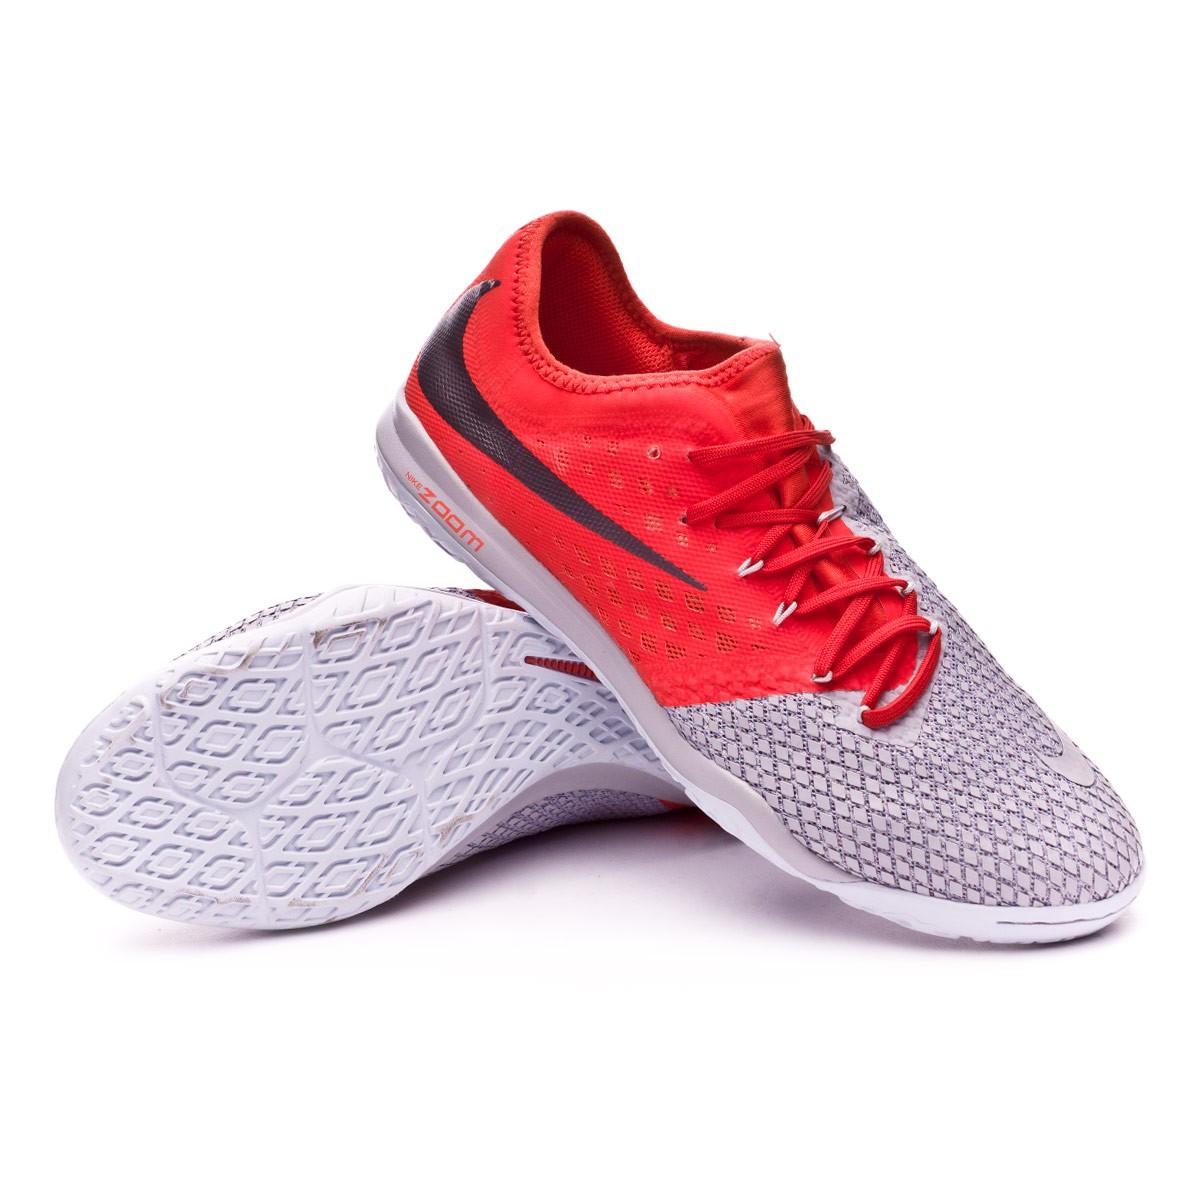 Sombra Religioso pared  Futsal Boot Nike Hypervenom Zoom PhantomX III Pro IC Wolf grey-Metallic  dark grey-Light crimson - Football store Fútbol Emotion